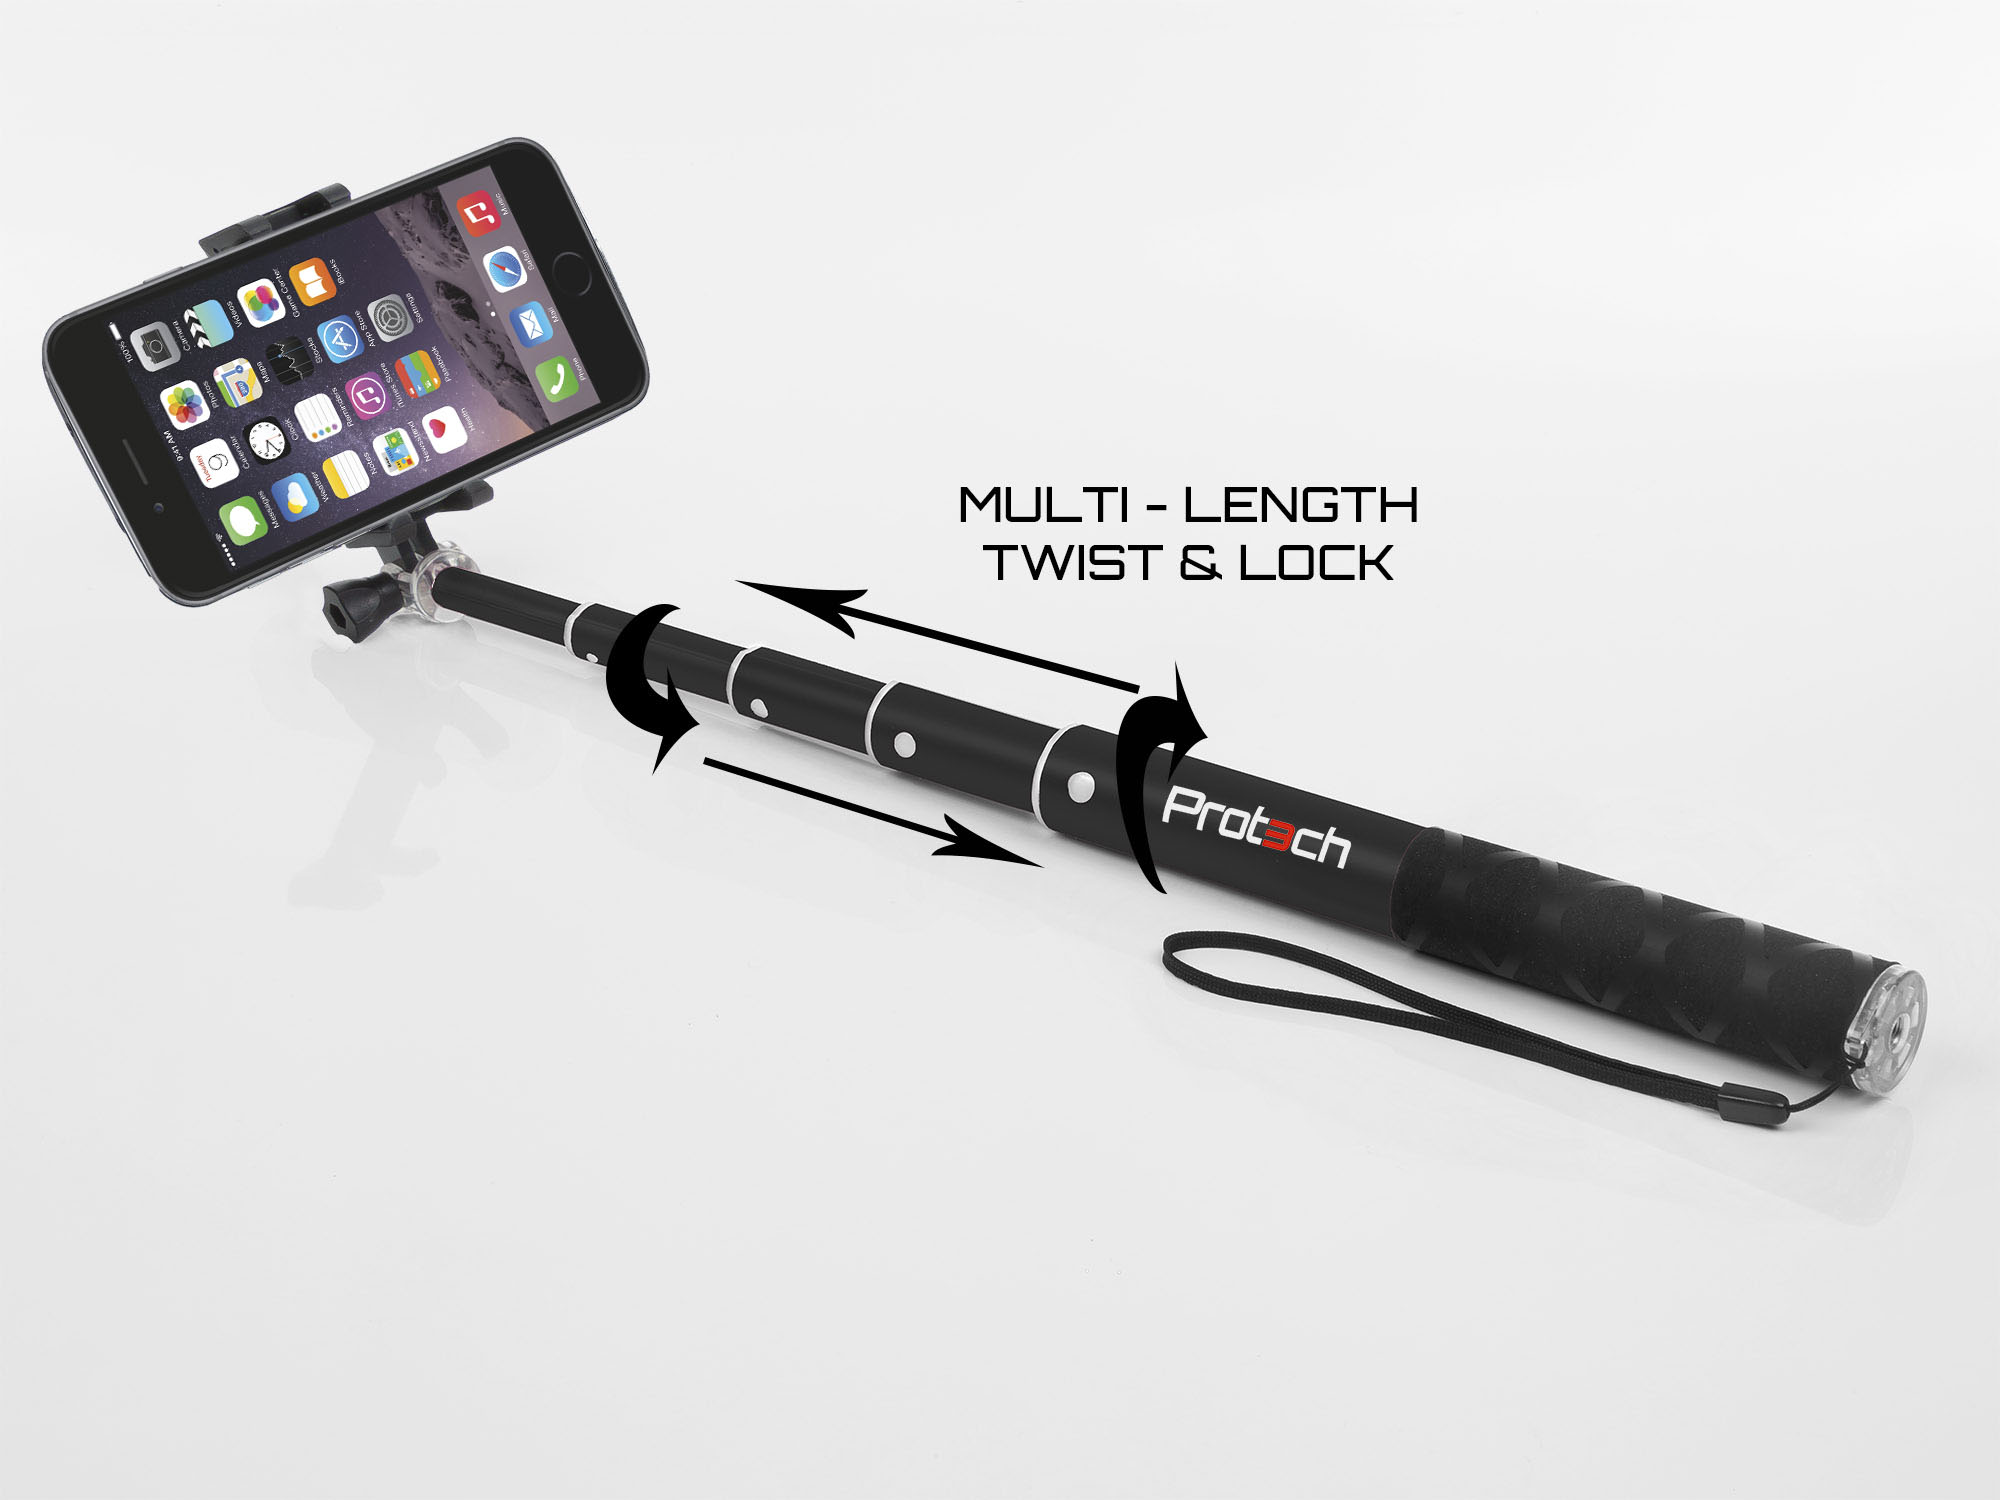 apple iphone monopod selfie stick 60cm telescopic compact bluetooth wireless ebay. Black Bedroom Furniture Sets. Home Design Ideas